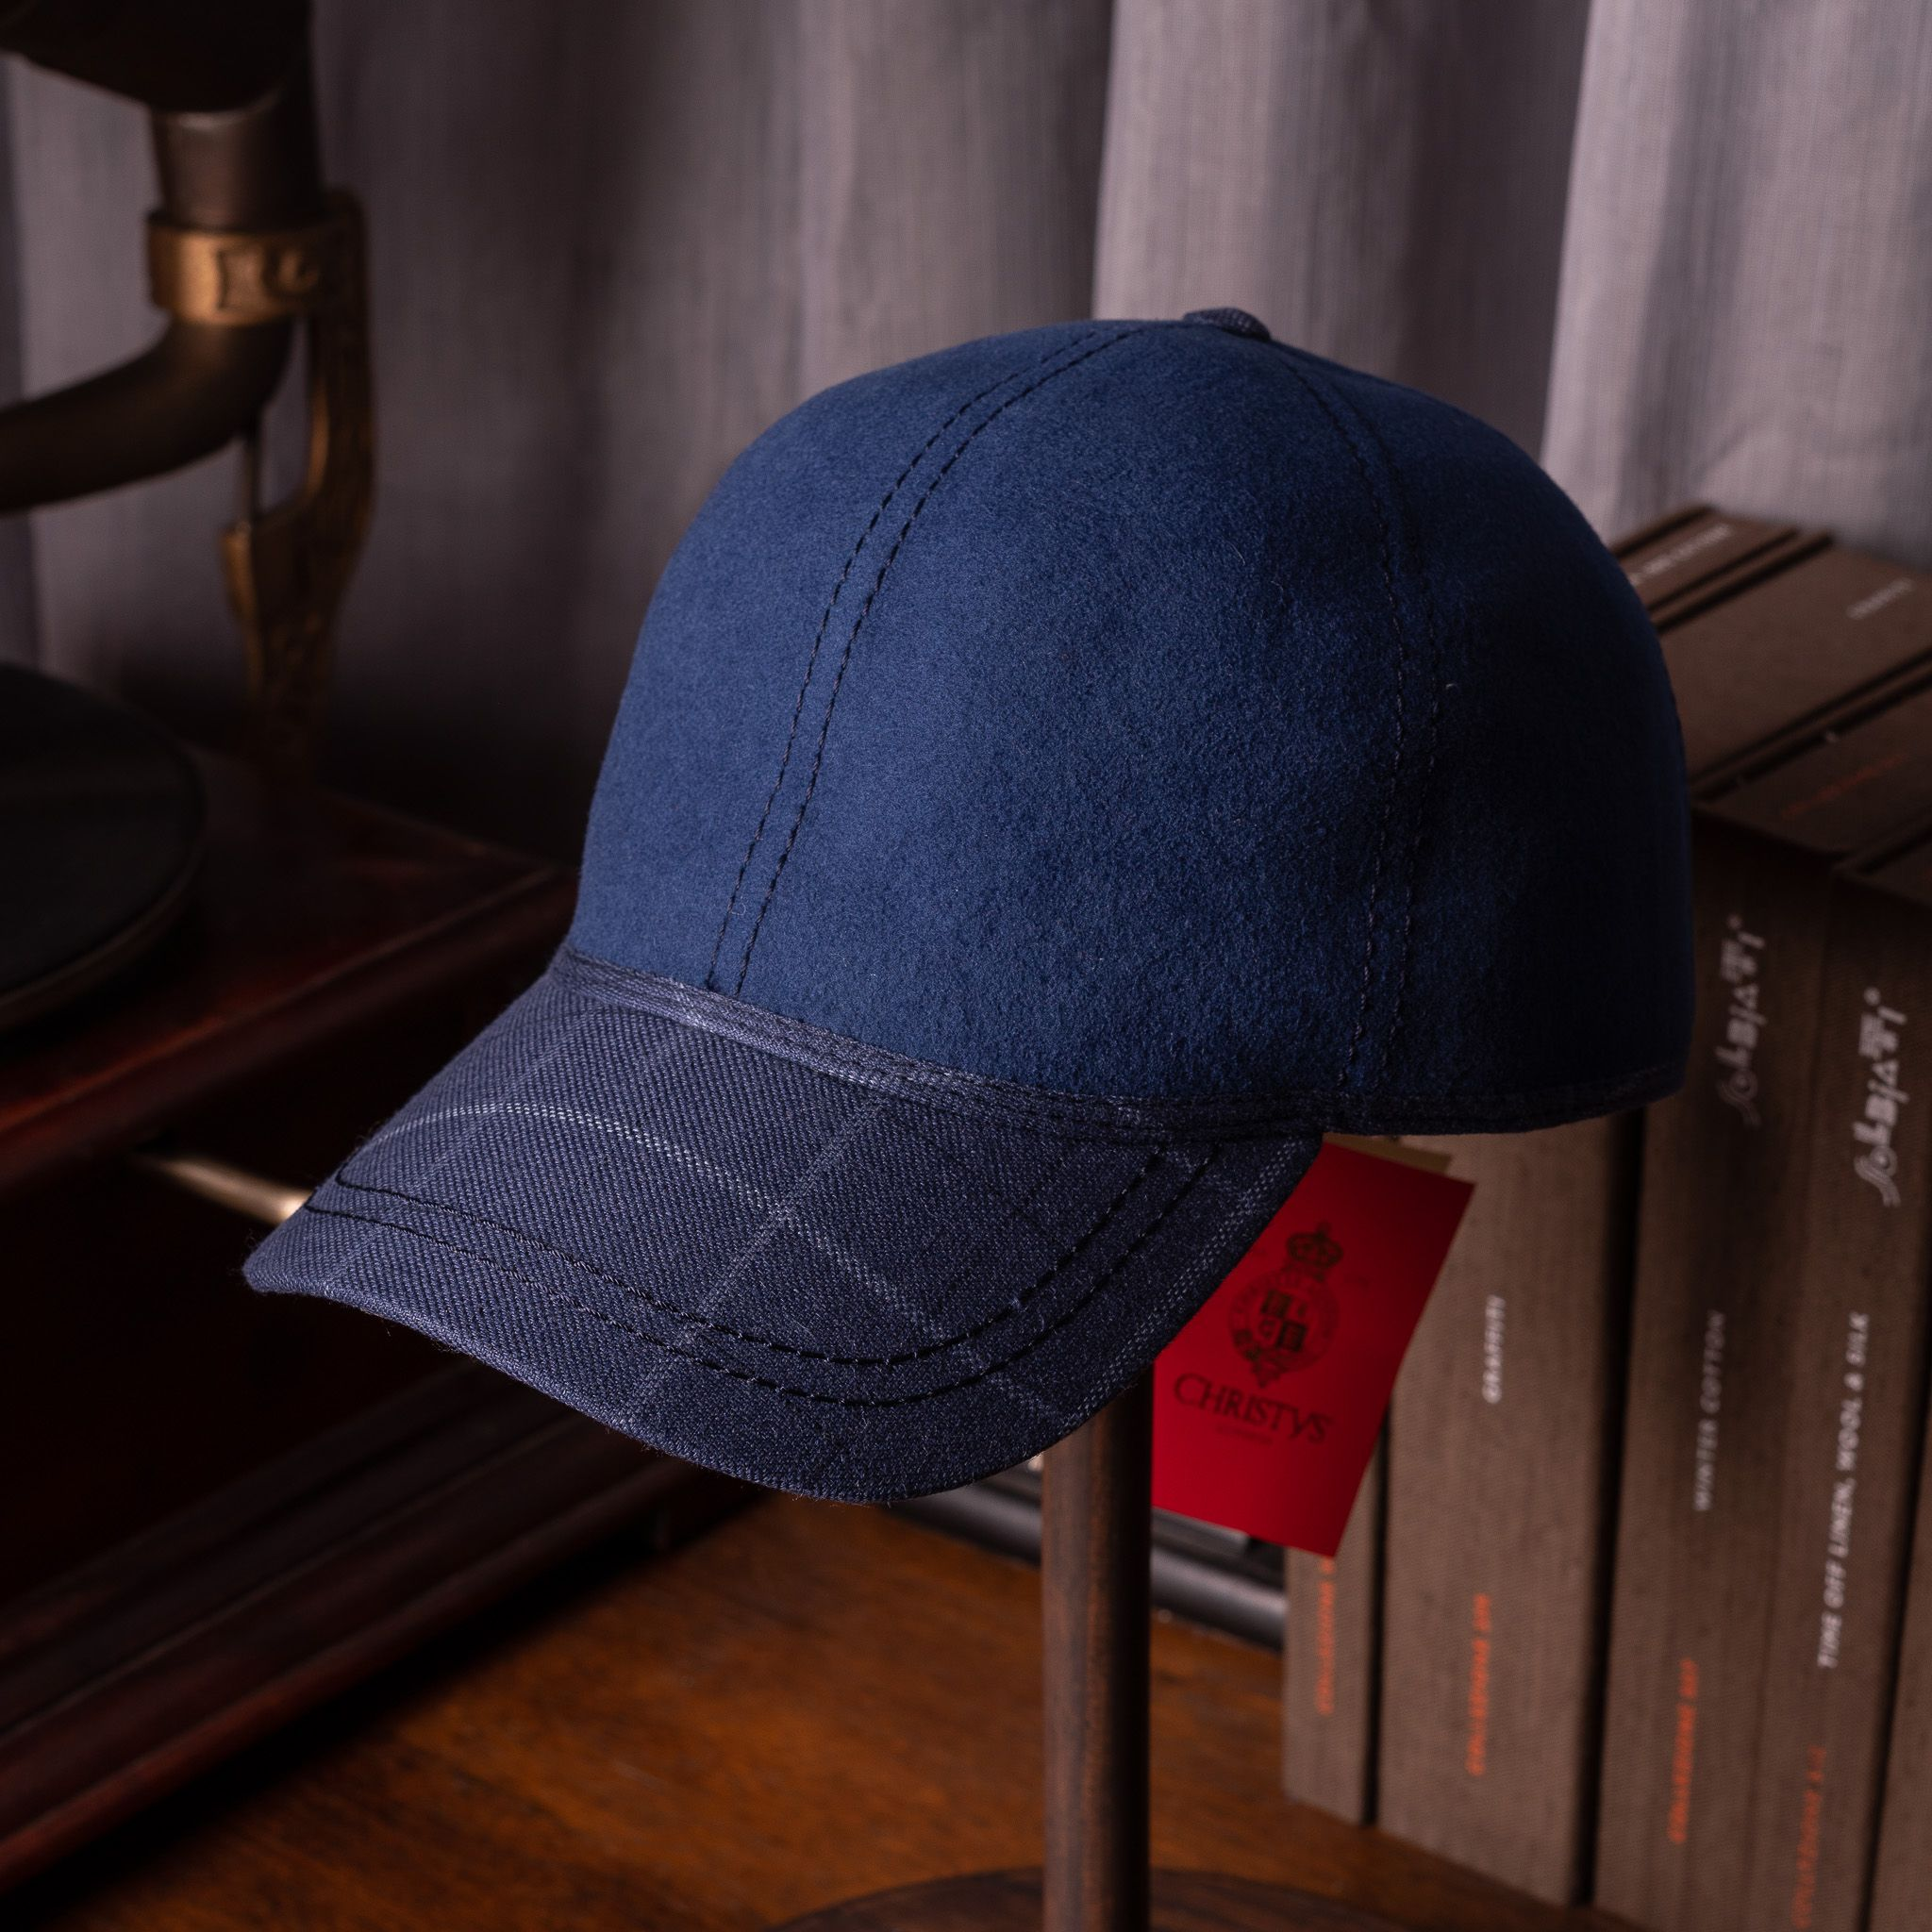 Christy's Baseball cap Navy with Blue Raker Check